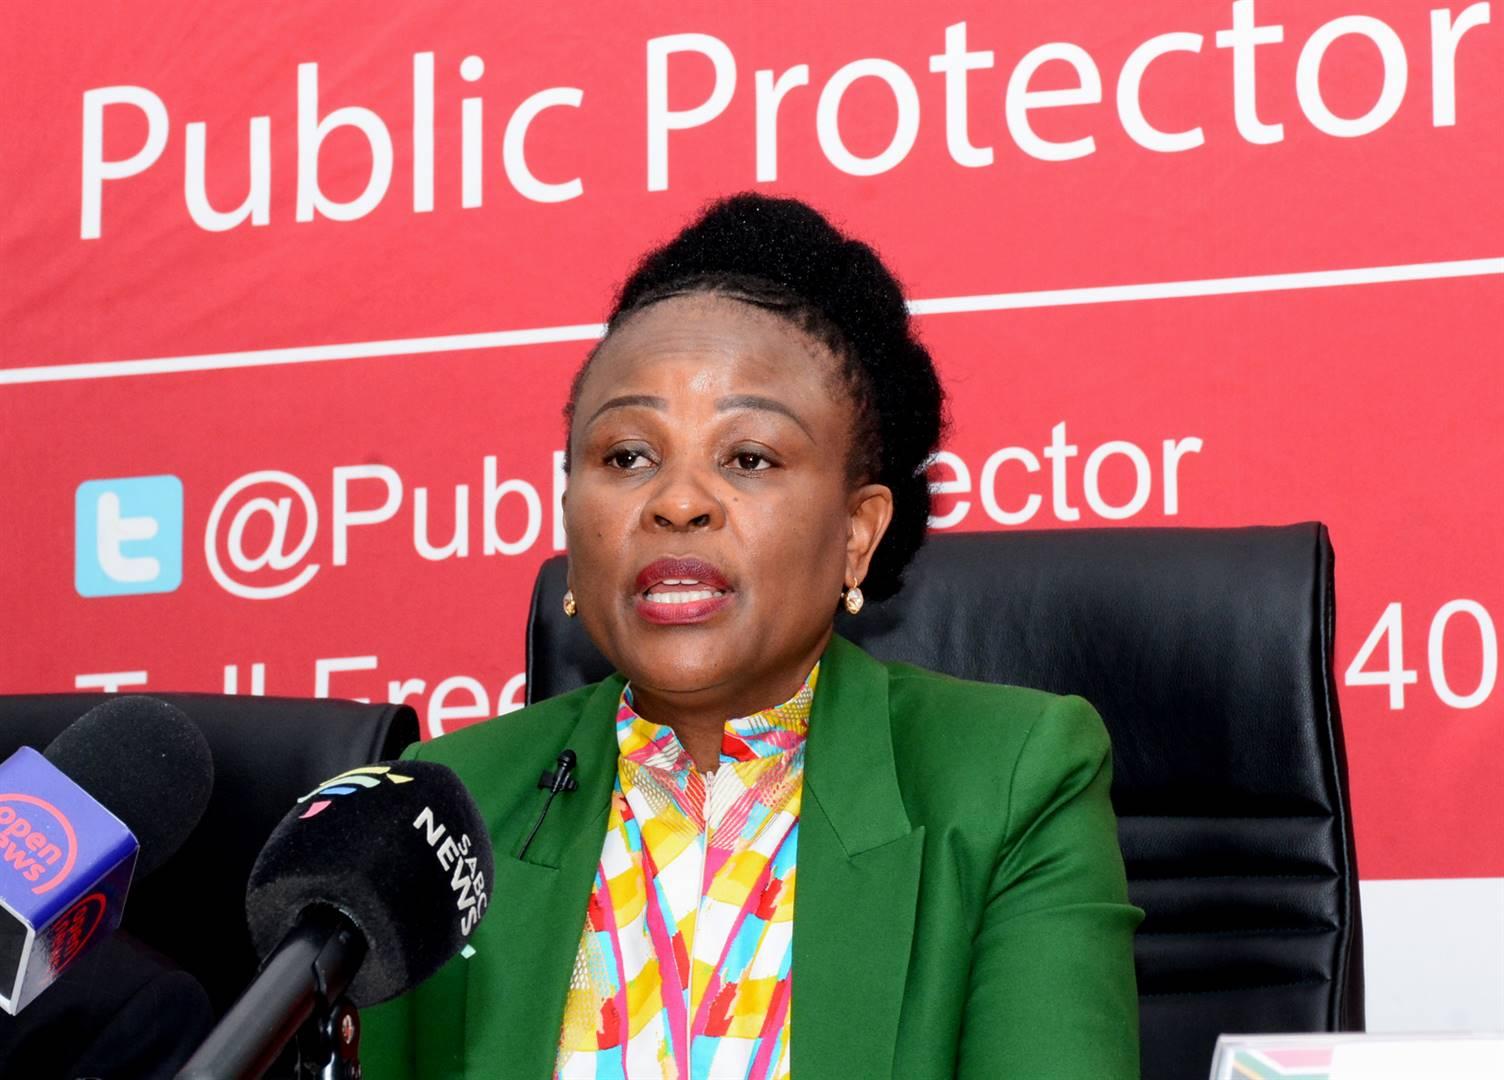 South Africa no longer has a public protector | News24